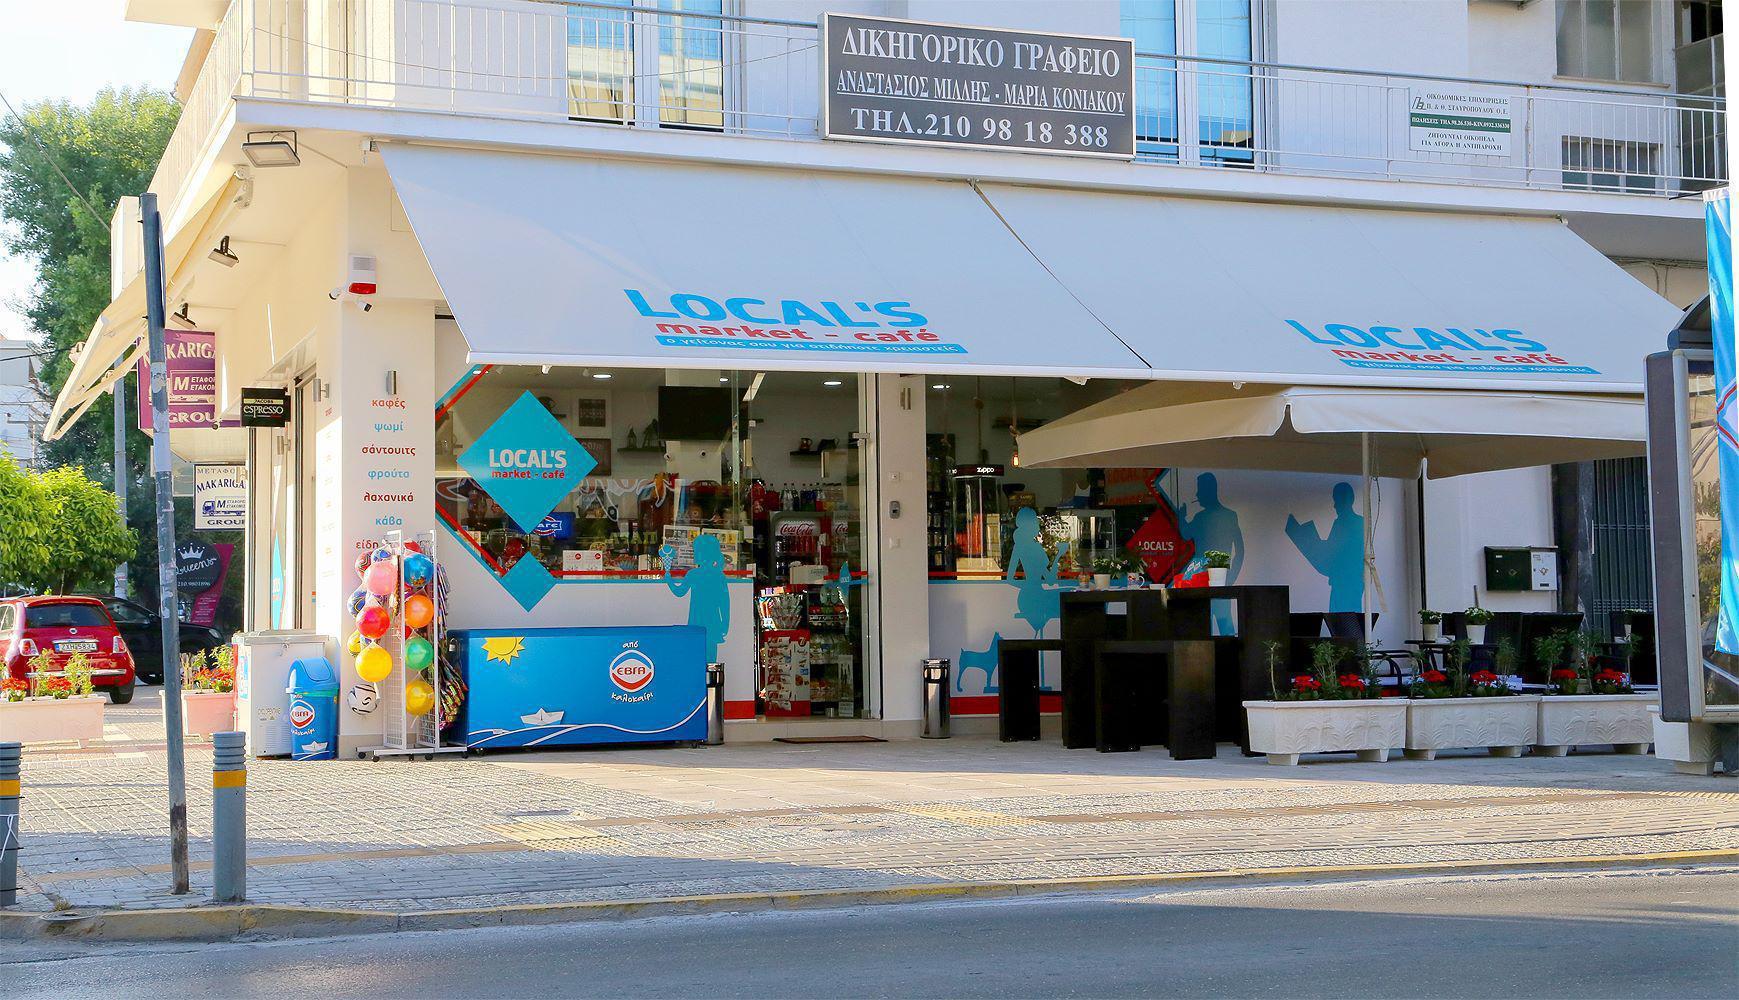 LOCALs Market - Cafe gallery